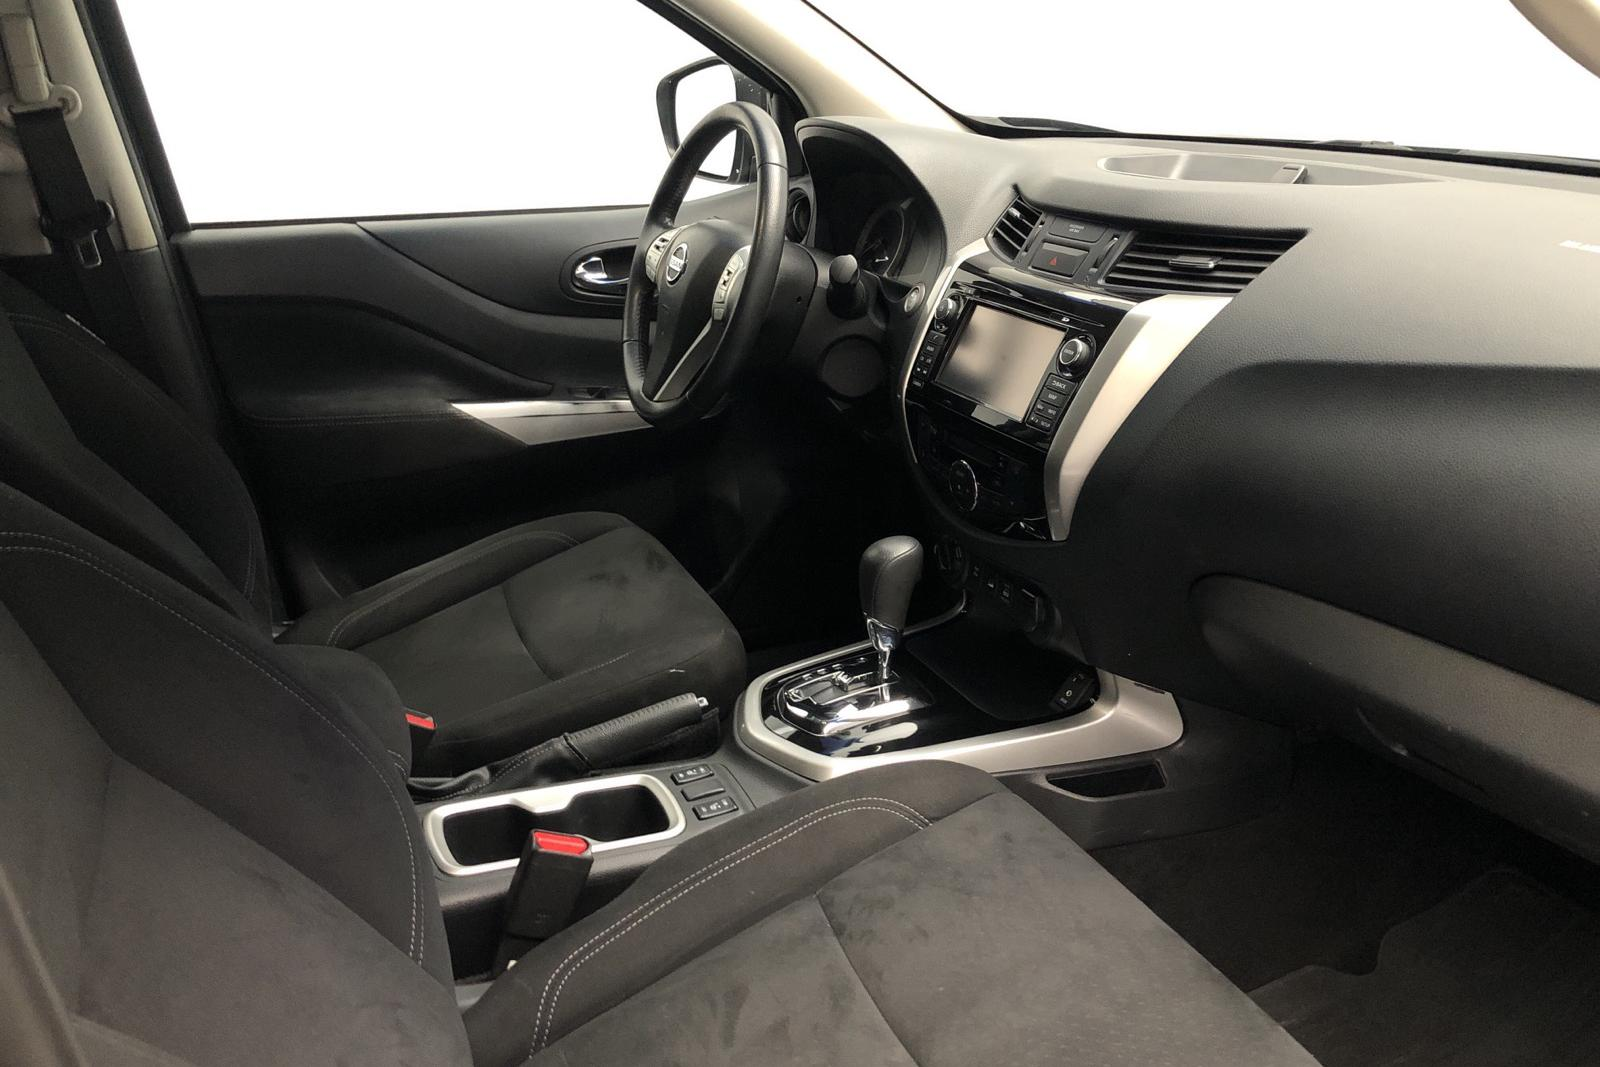 Nissan Navara 2.3 dCi 4x4 (190hk) - 14 500 mil - Automat - Dark Blue - 2017